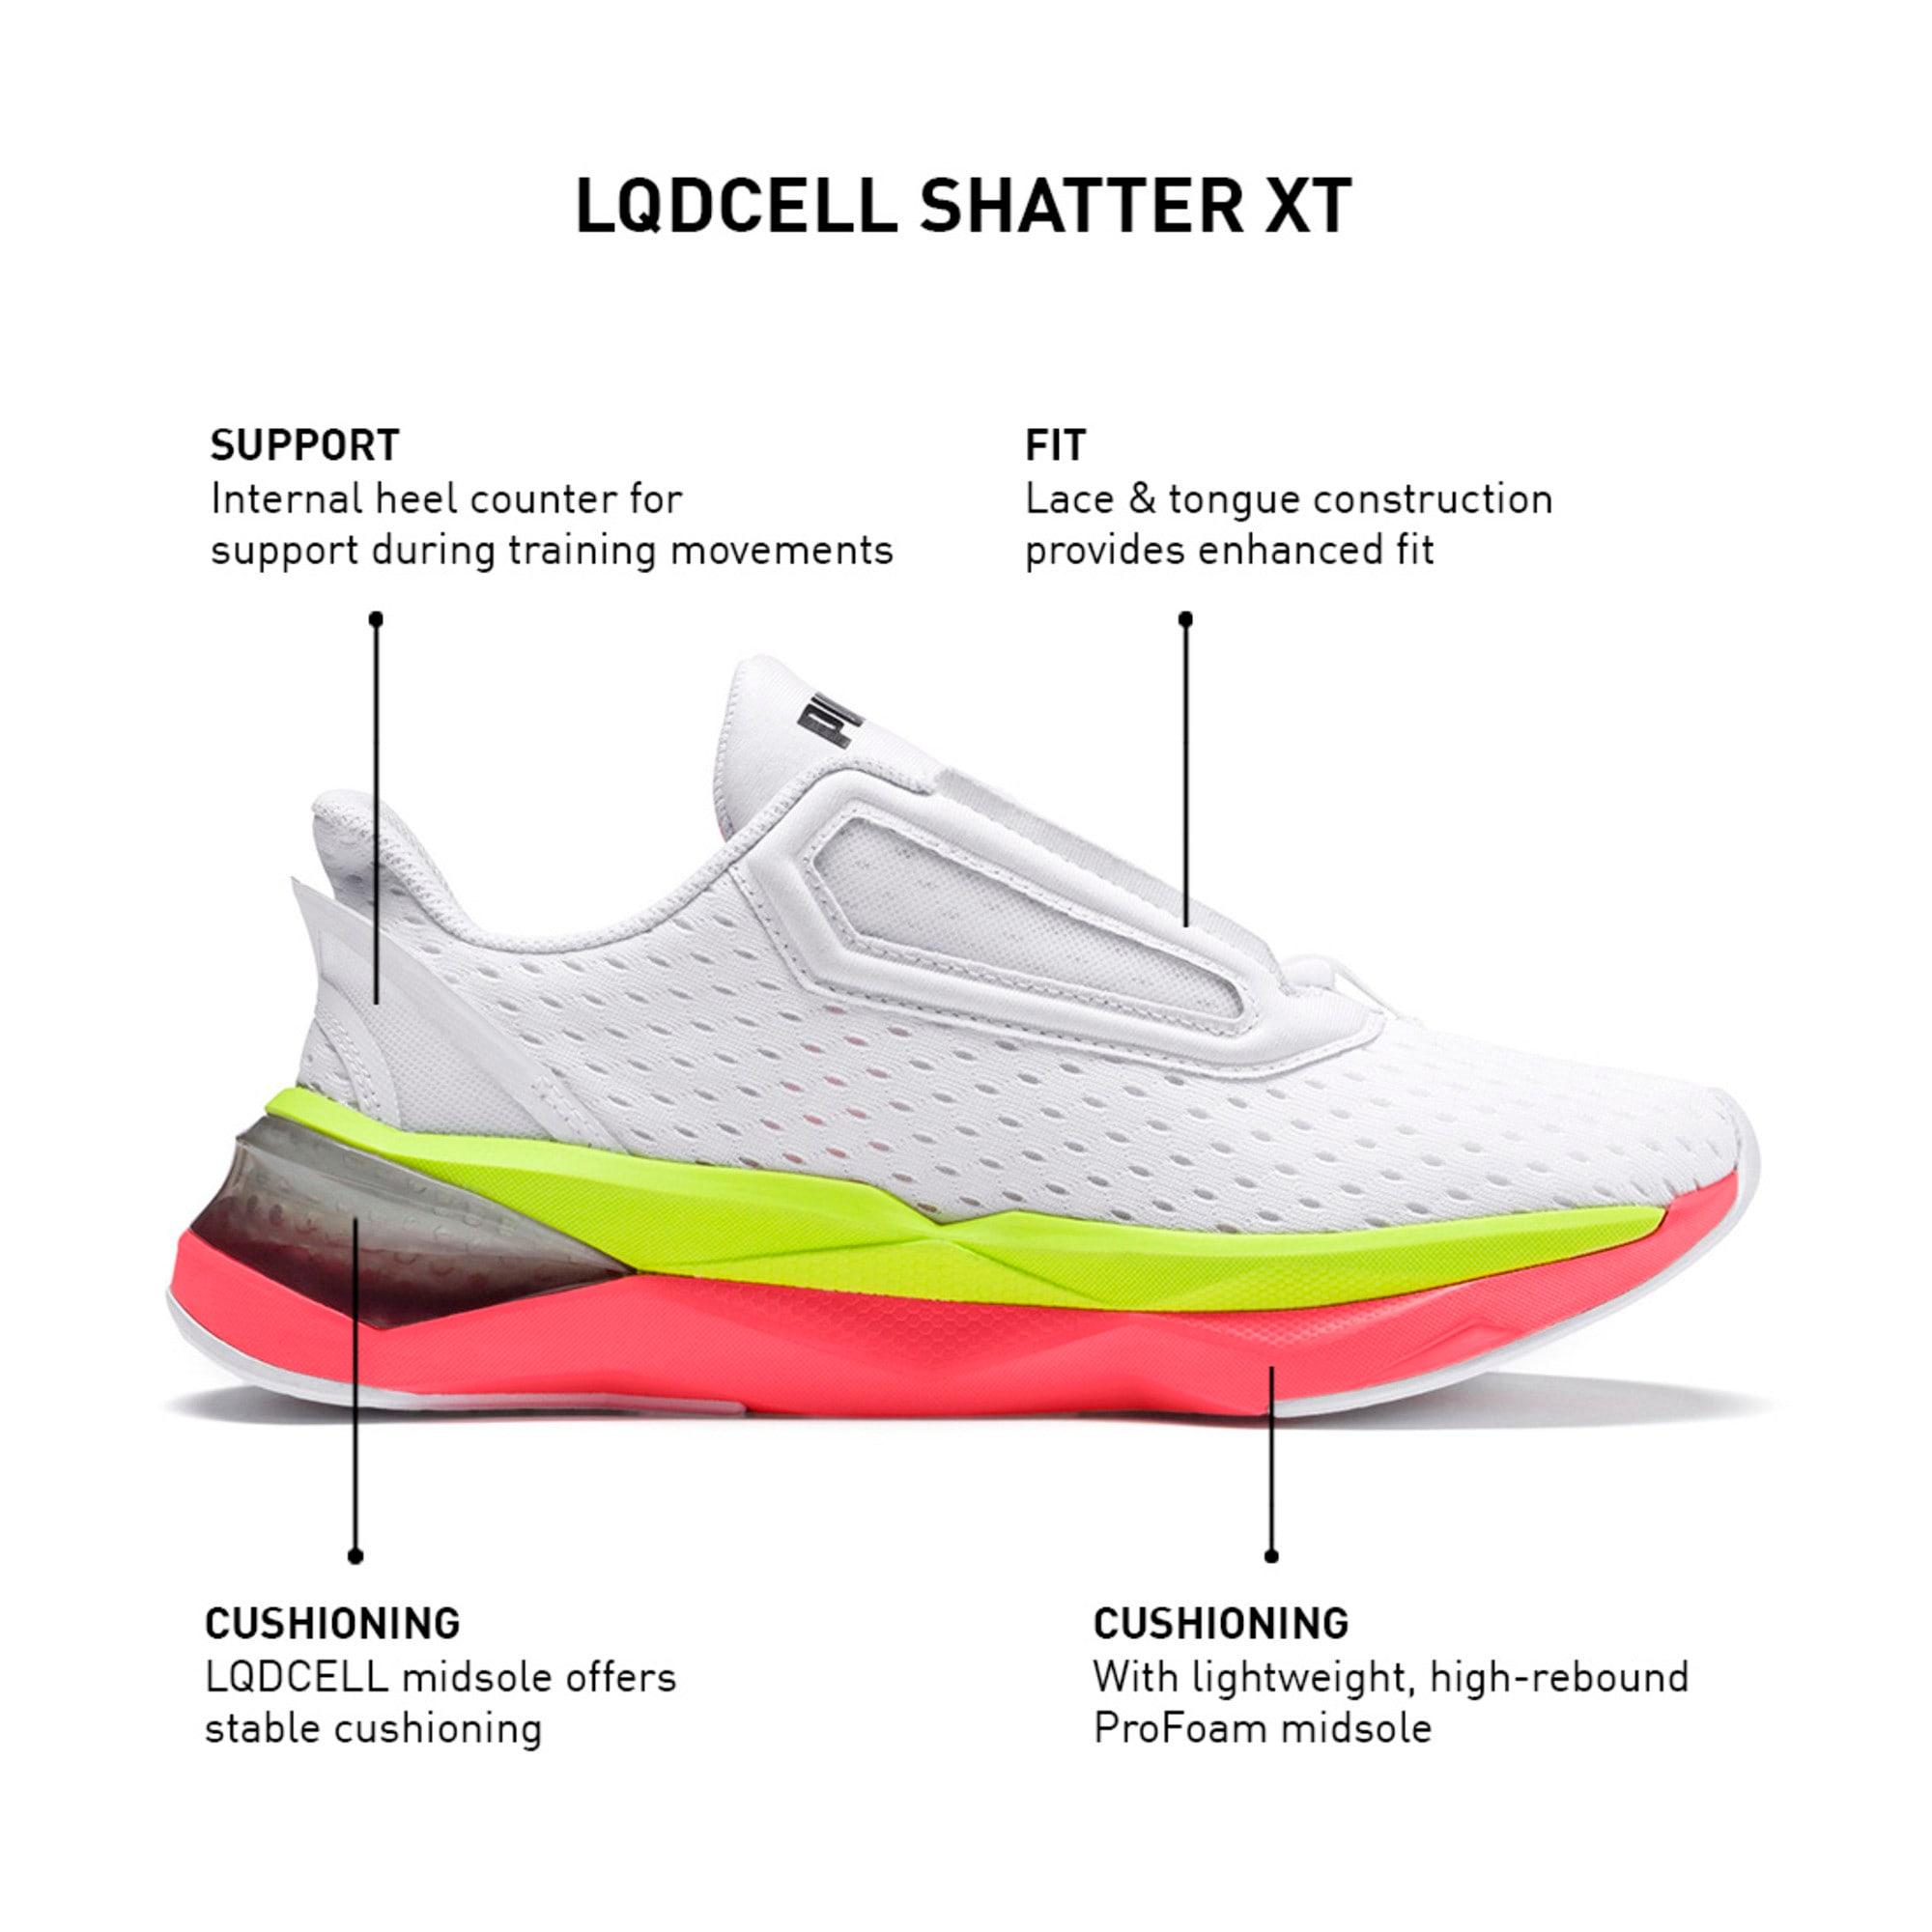 Thumbnail 12 of LQDCell Shatter XT Women's Training Shoes, Puma White-Pink Alert, medium-IND